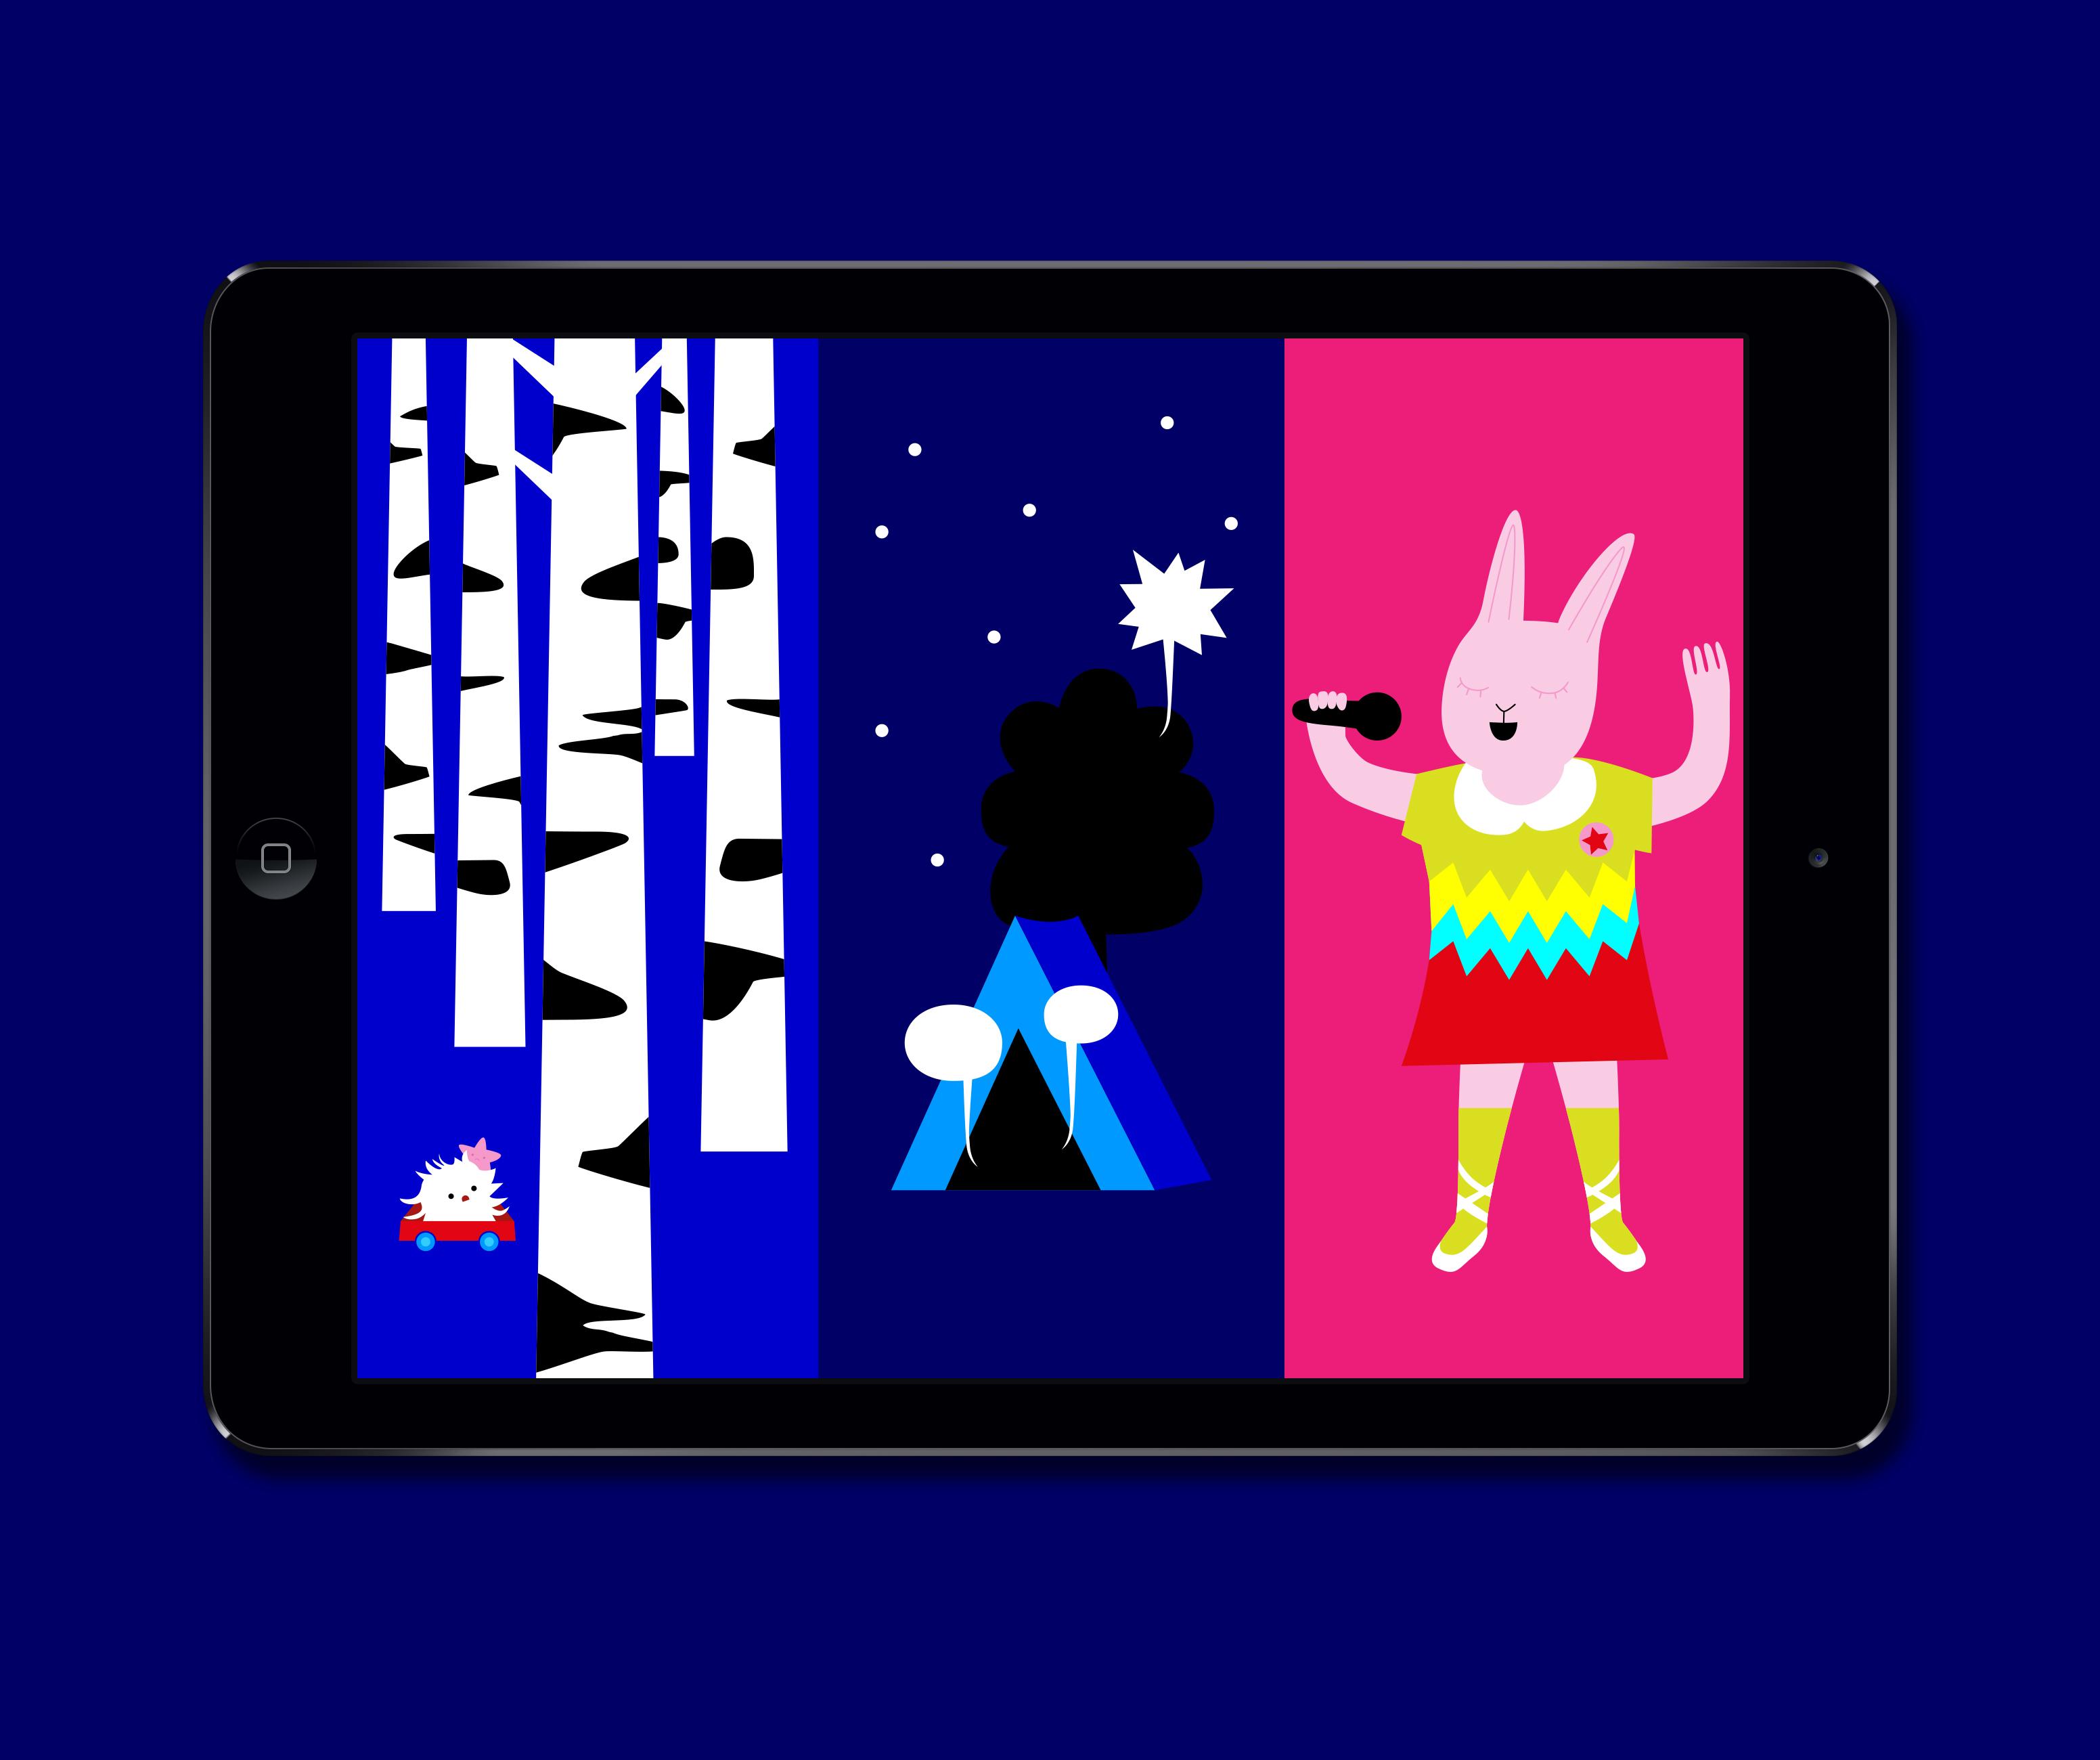 Character Design Ipad App : Character design ipad app character design andreas olofsson